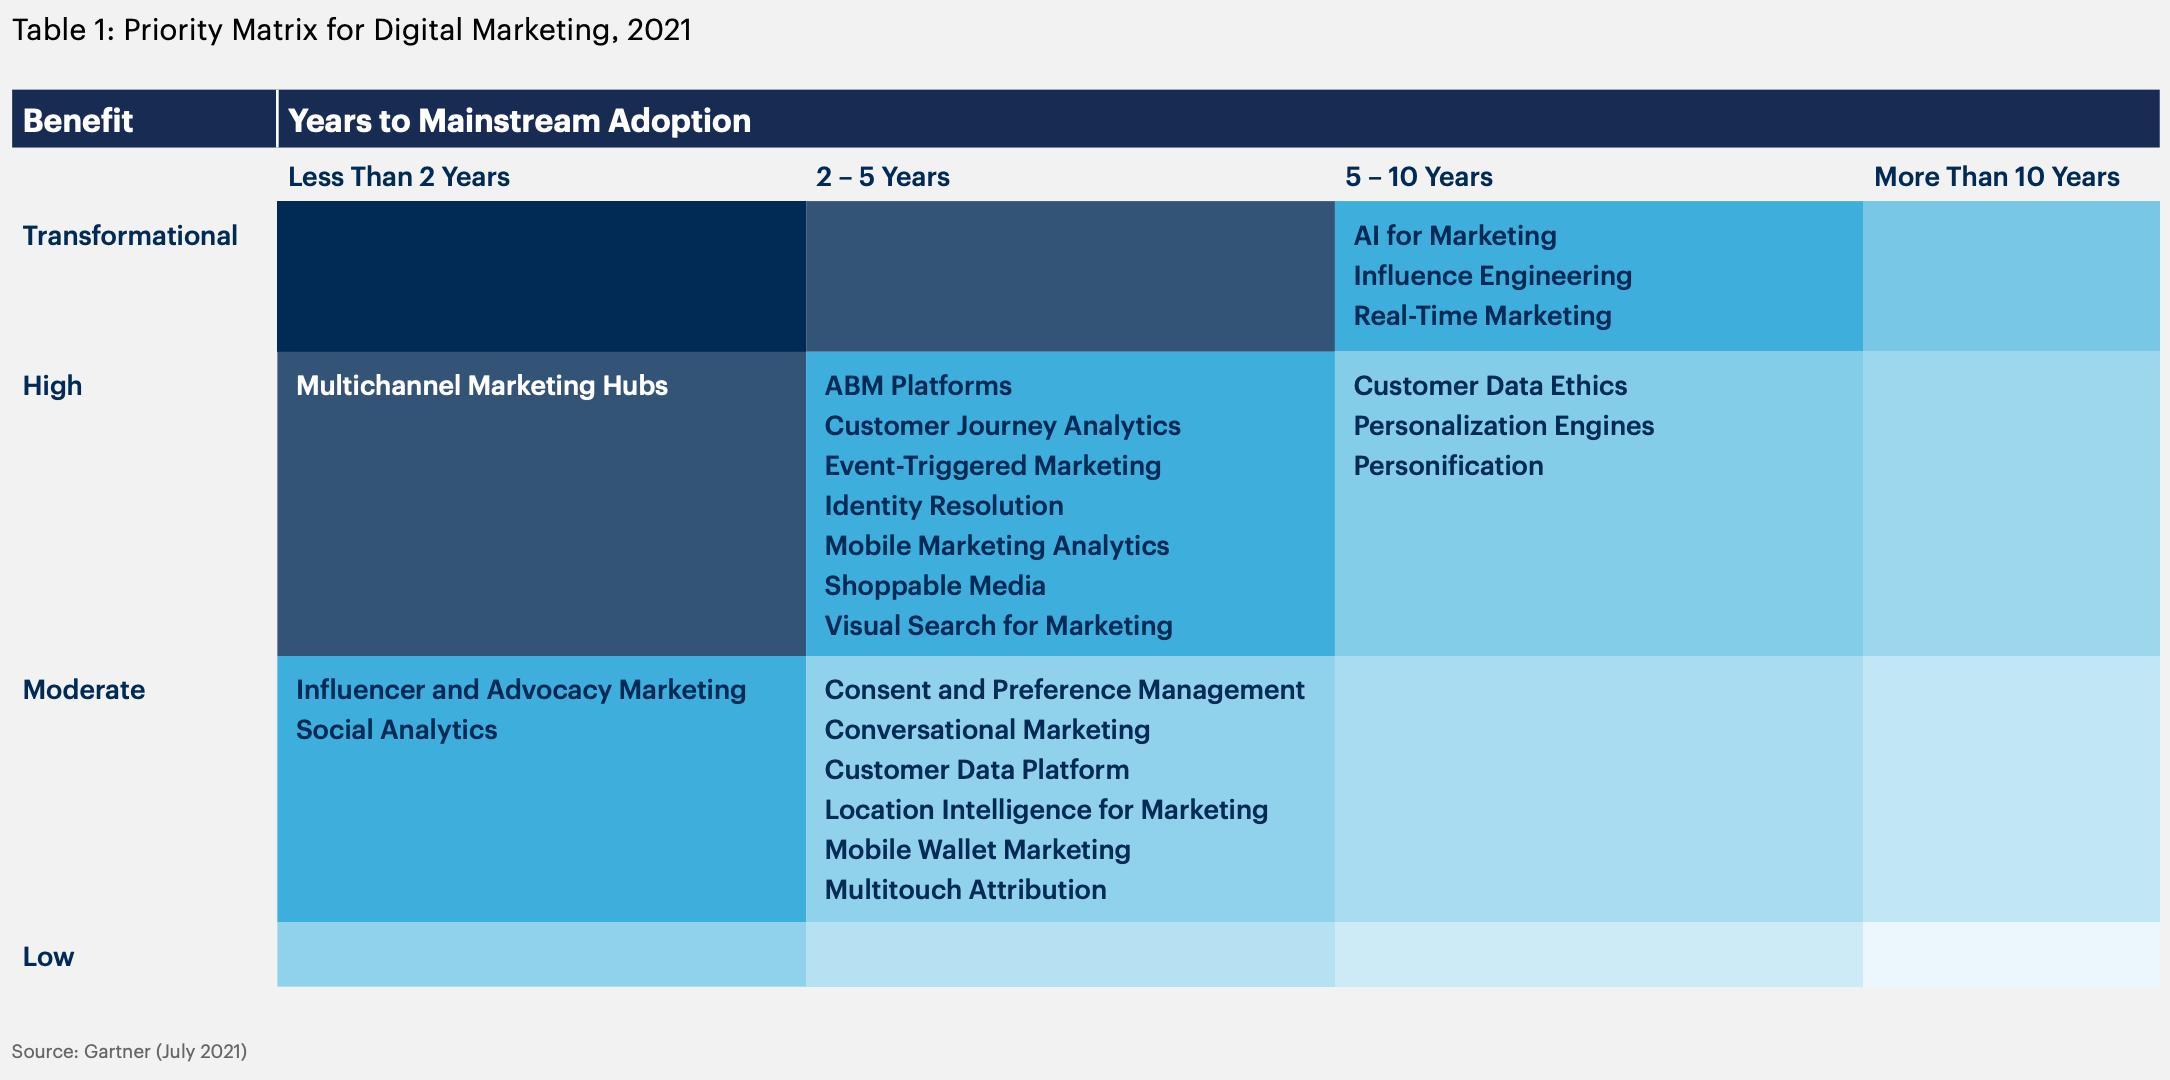 gartner priority matrix for digital marketing 2021